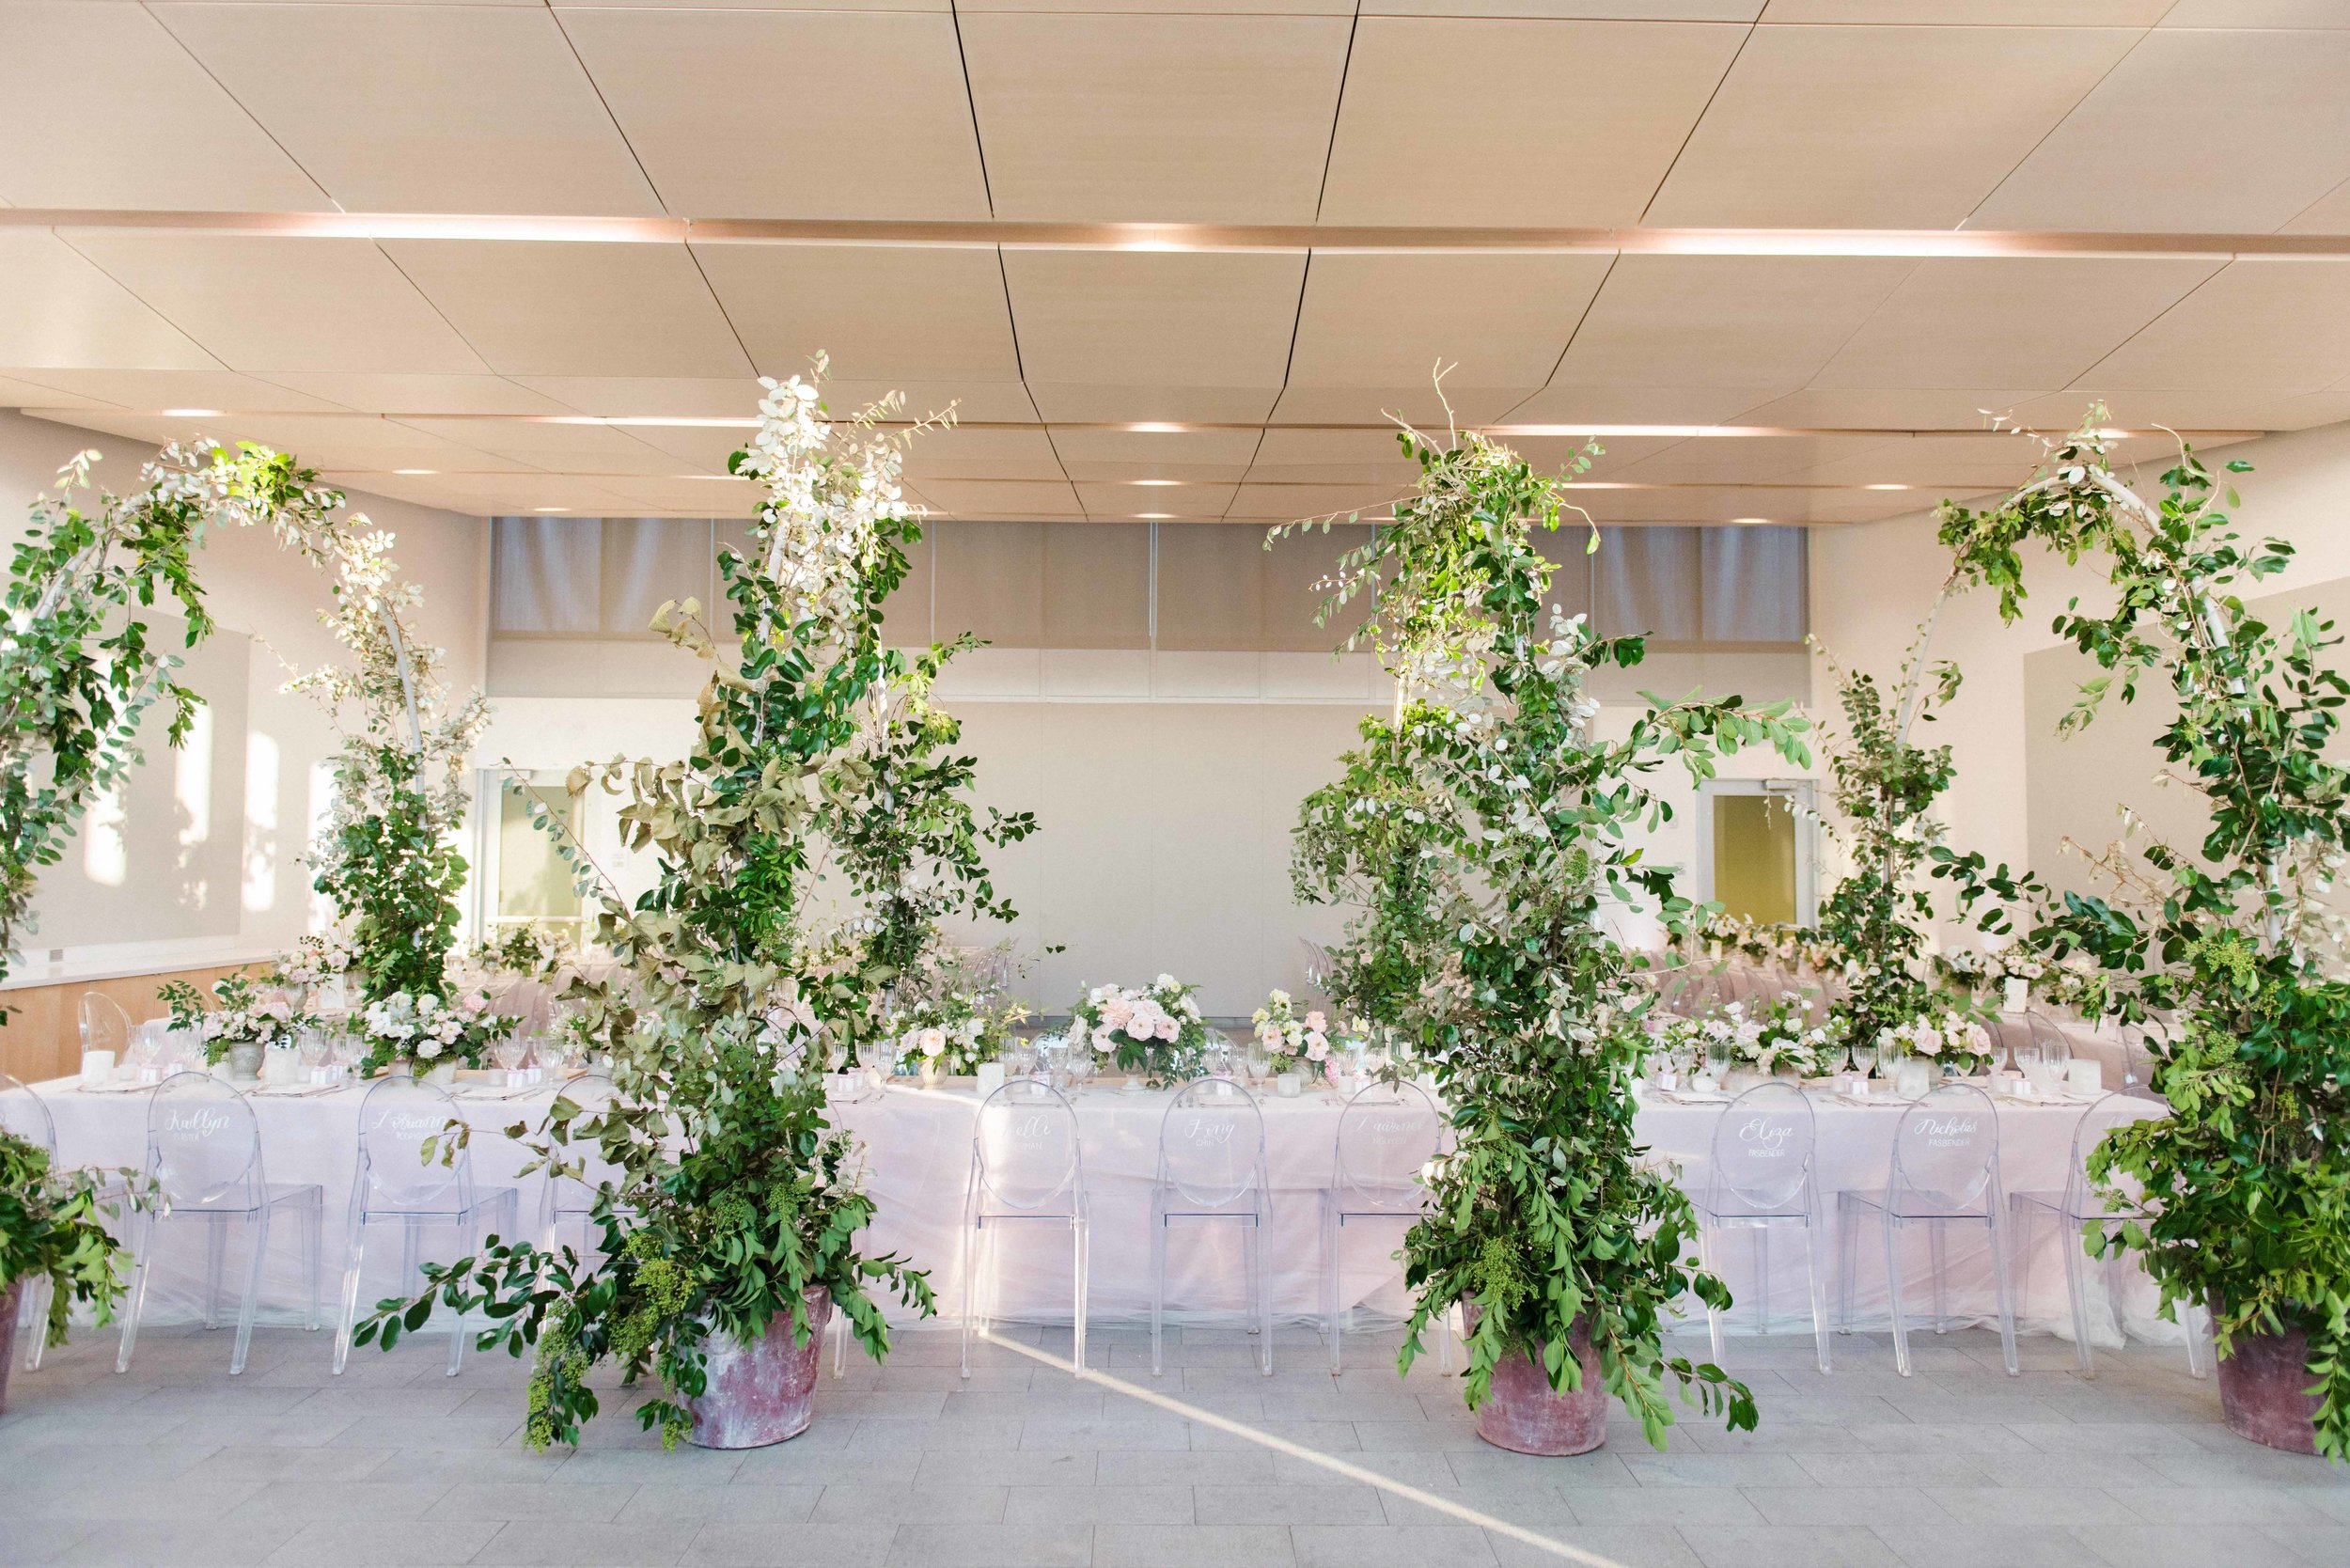 Martha-Stewart-Wedding-Dana-Fernandez-Photography-Josh-Texas-Film-Houston-Wedding-Fine-Art-Photographer-McGovern-Centennial-Gardens-Top-Best-222.jpg